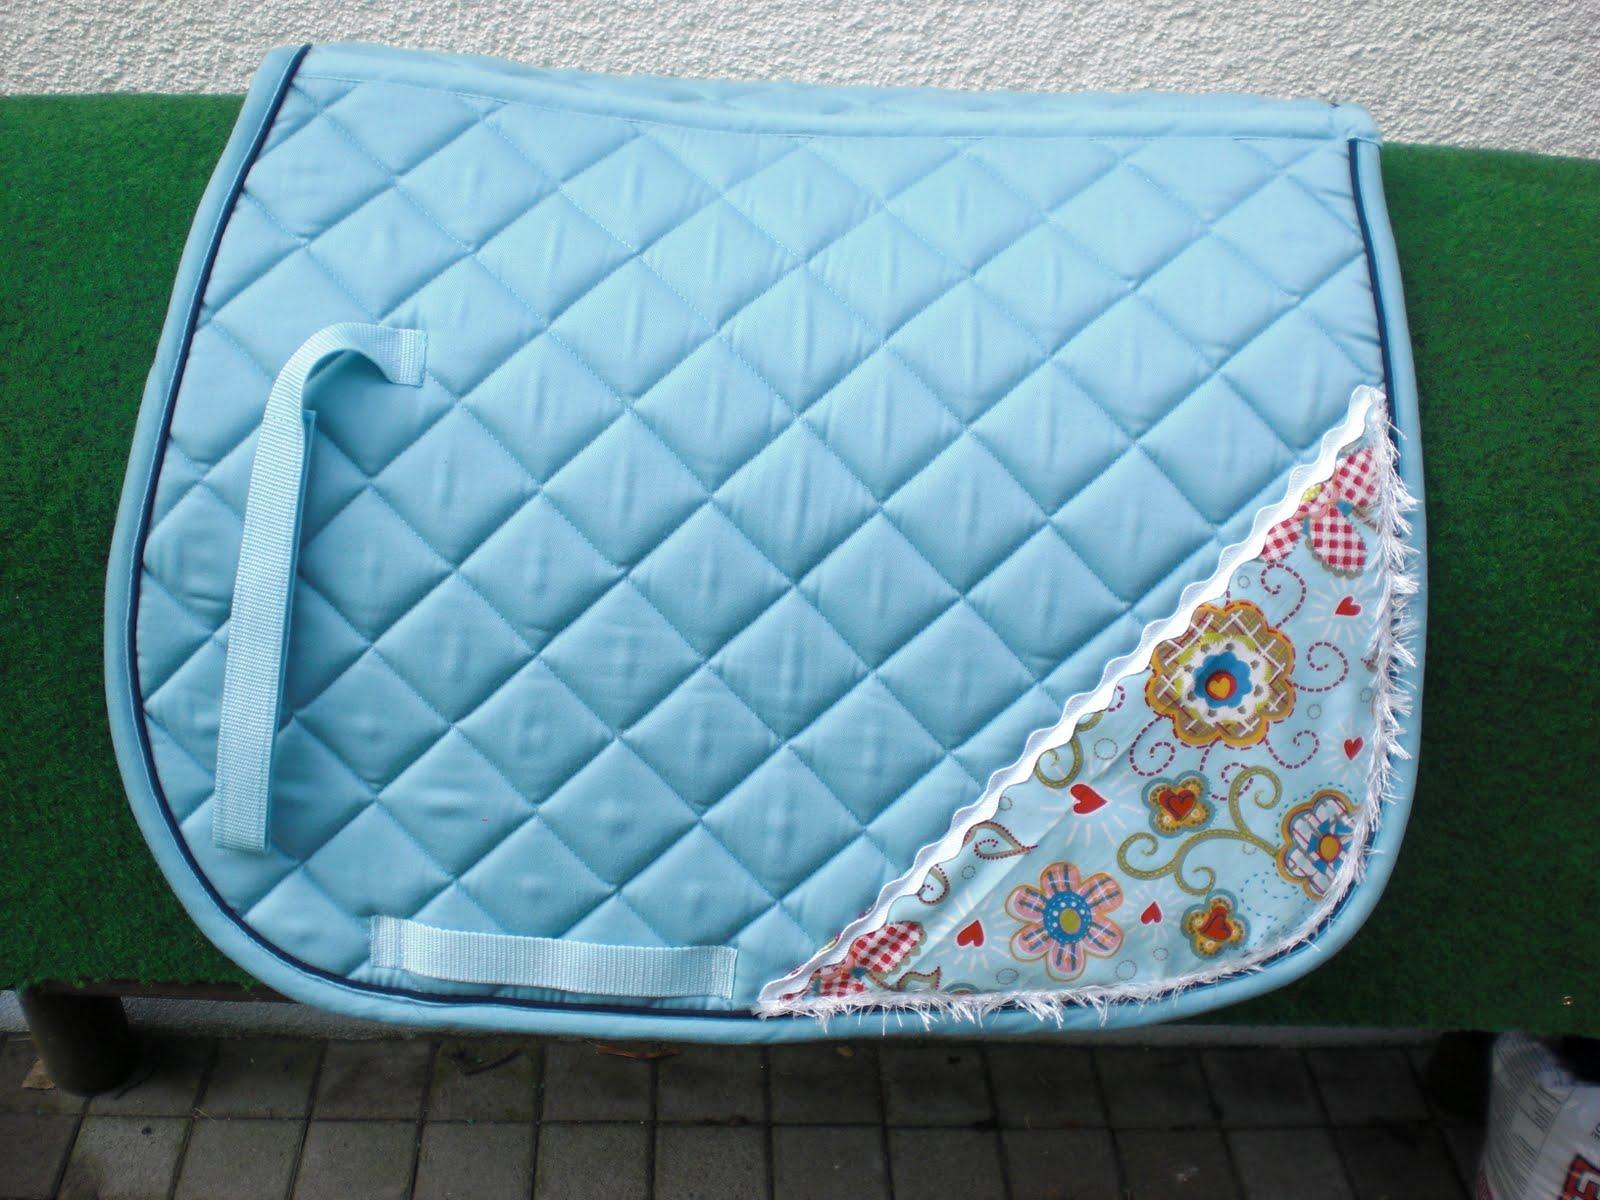 schnickschnack farbenfroh jp meets schabracke. Black Bedroom Furniture Sets. Home Design Ideas